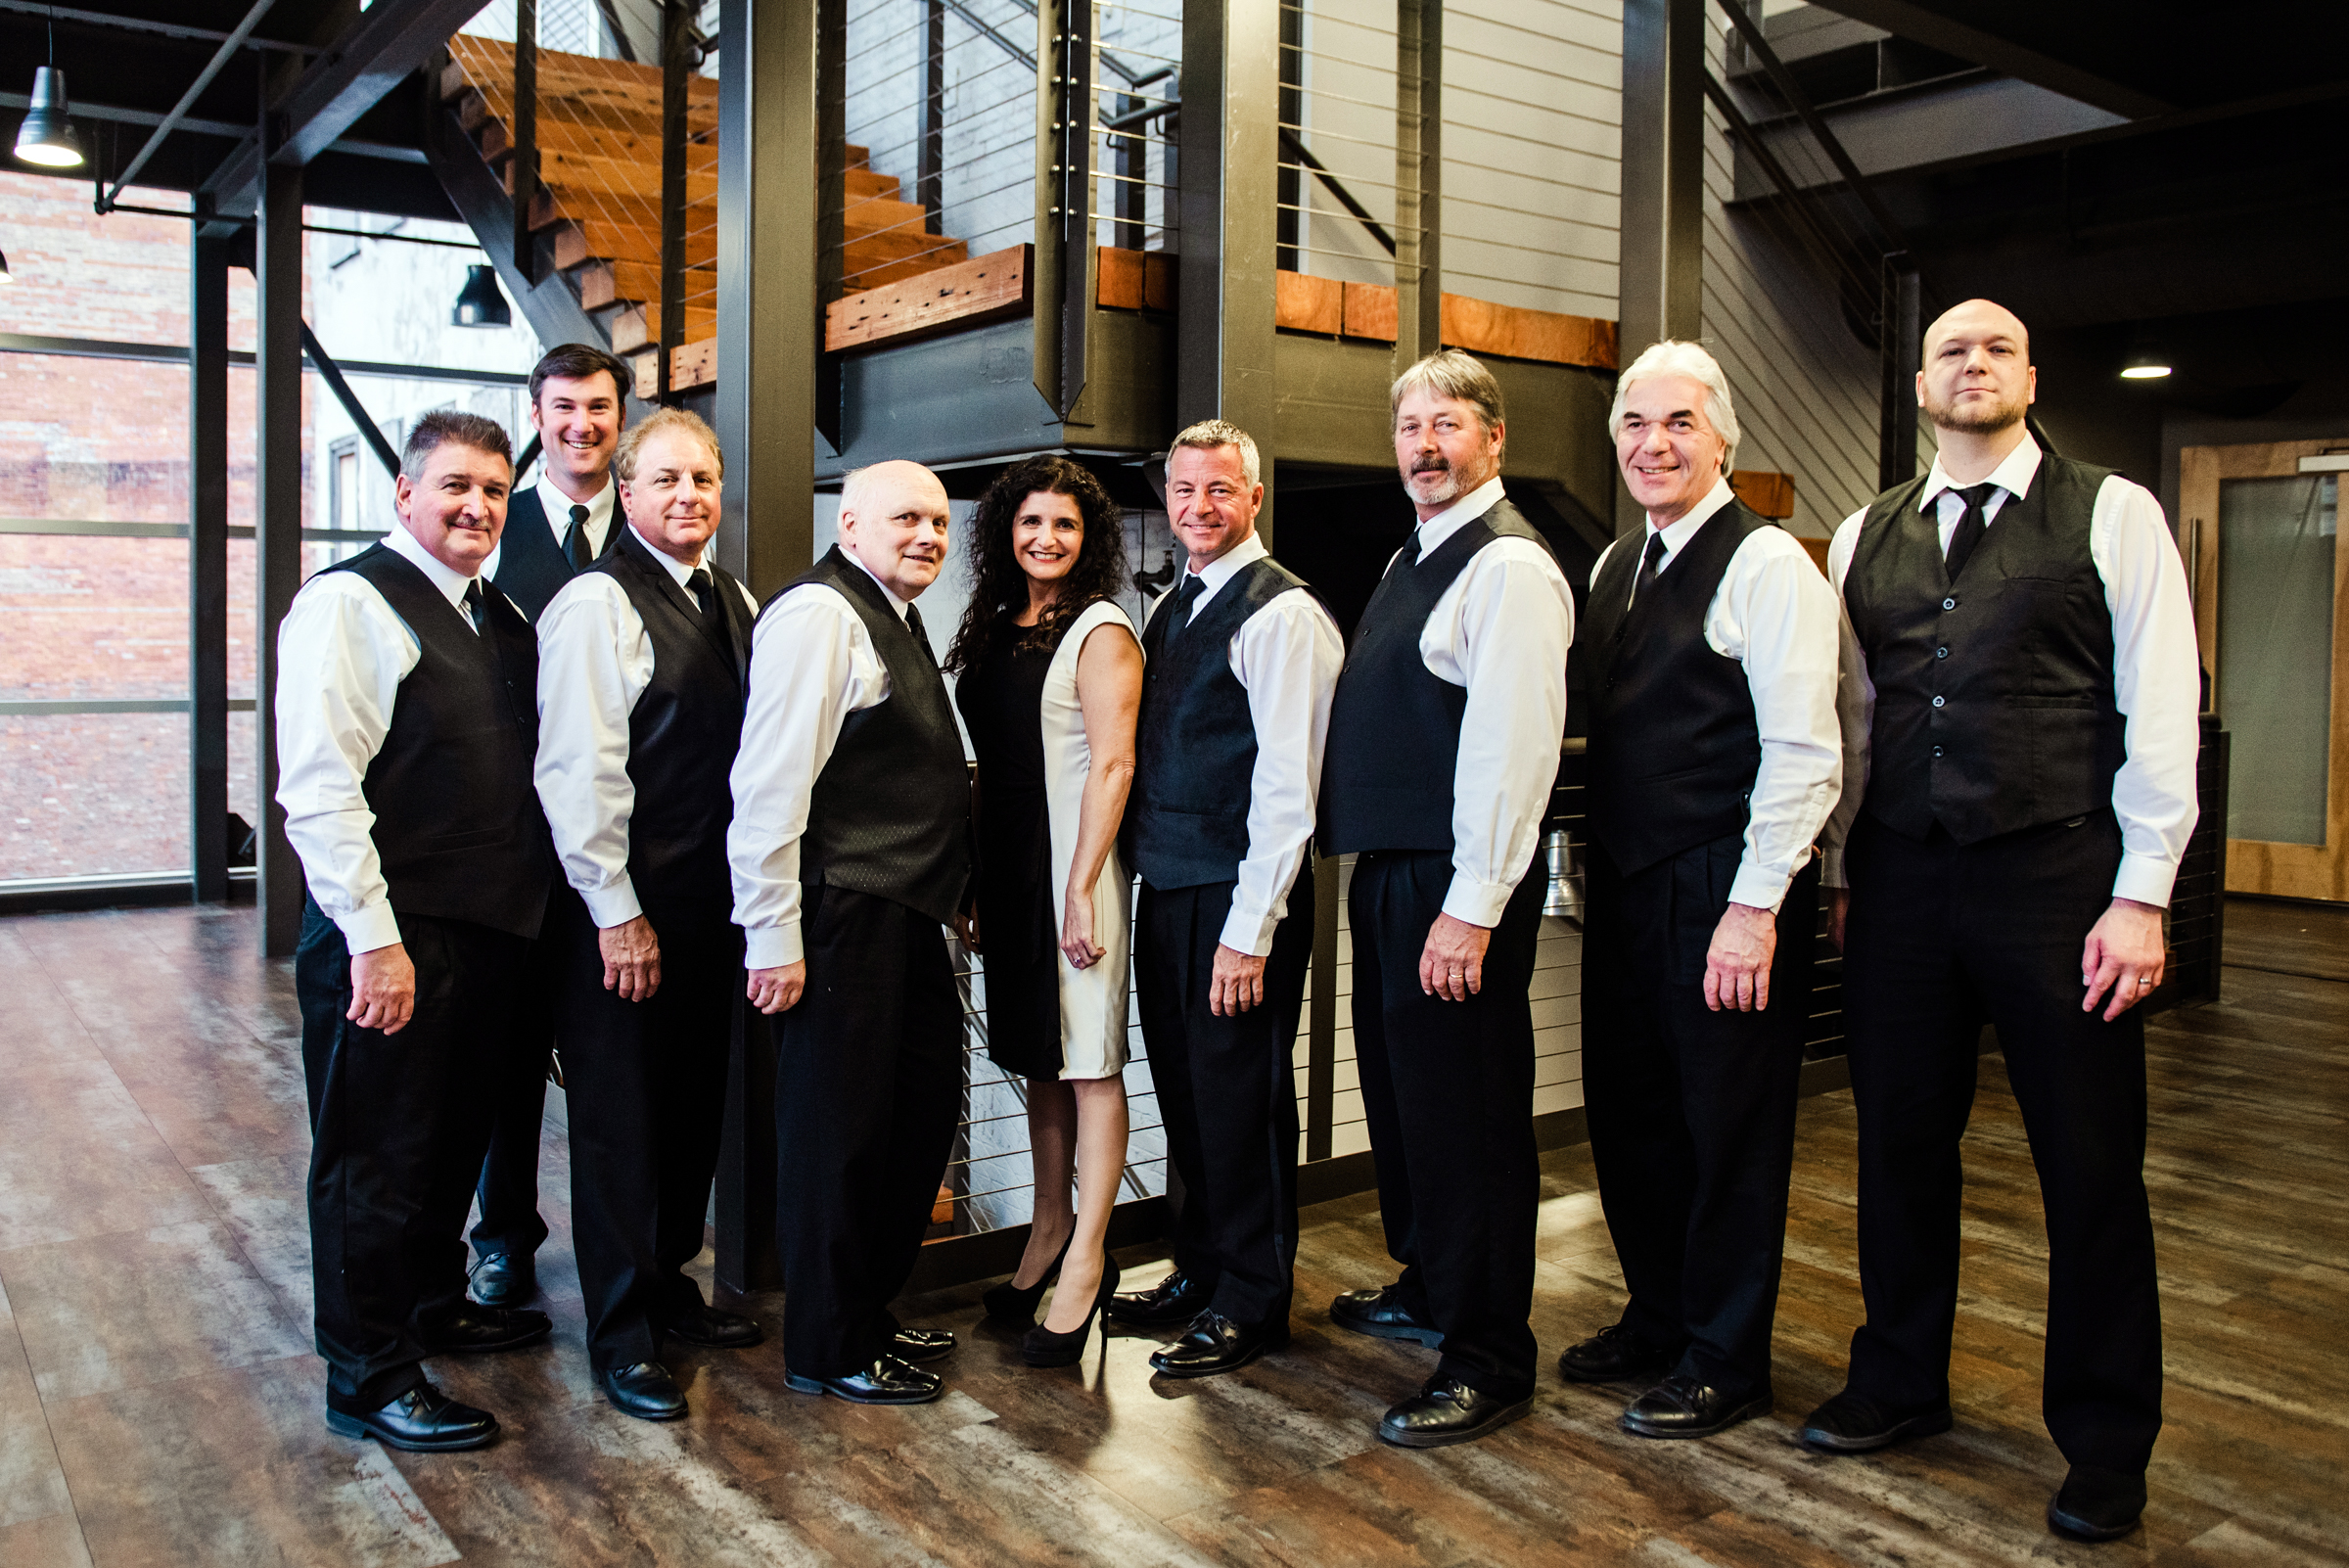 SKY_Armory_Syracuse_Wedding_JILL_STUDIO_Rochester_NY_Photographer_DSC_6159.jpg